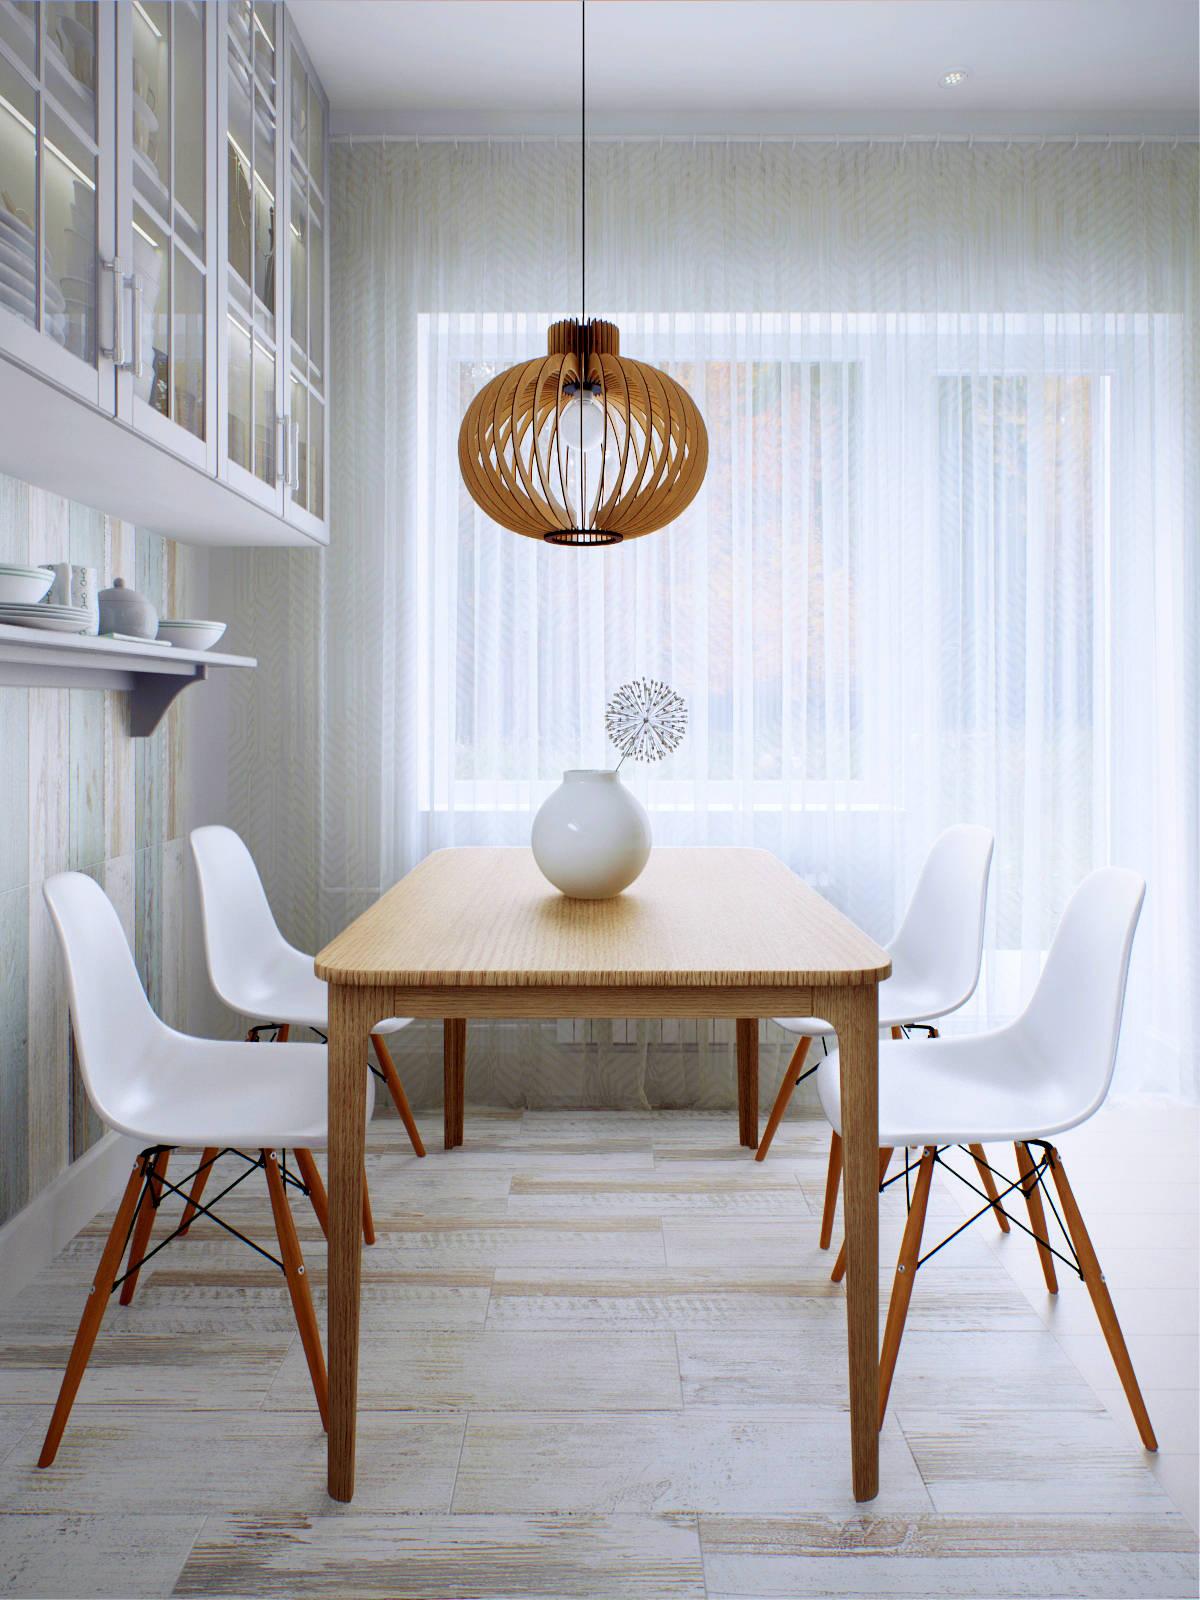 Skandinavian design